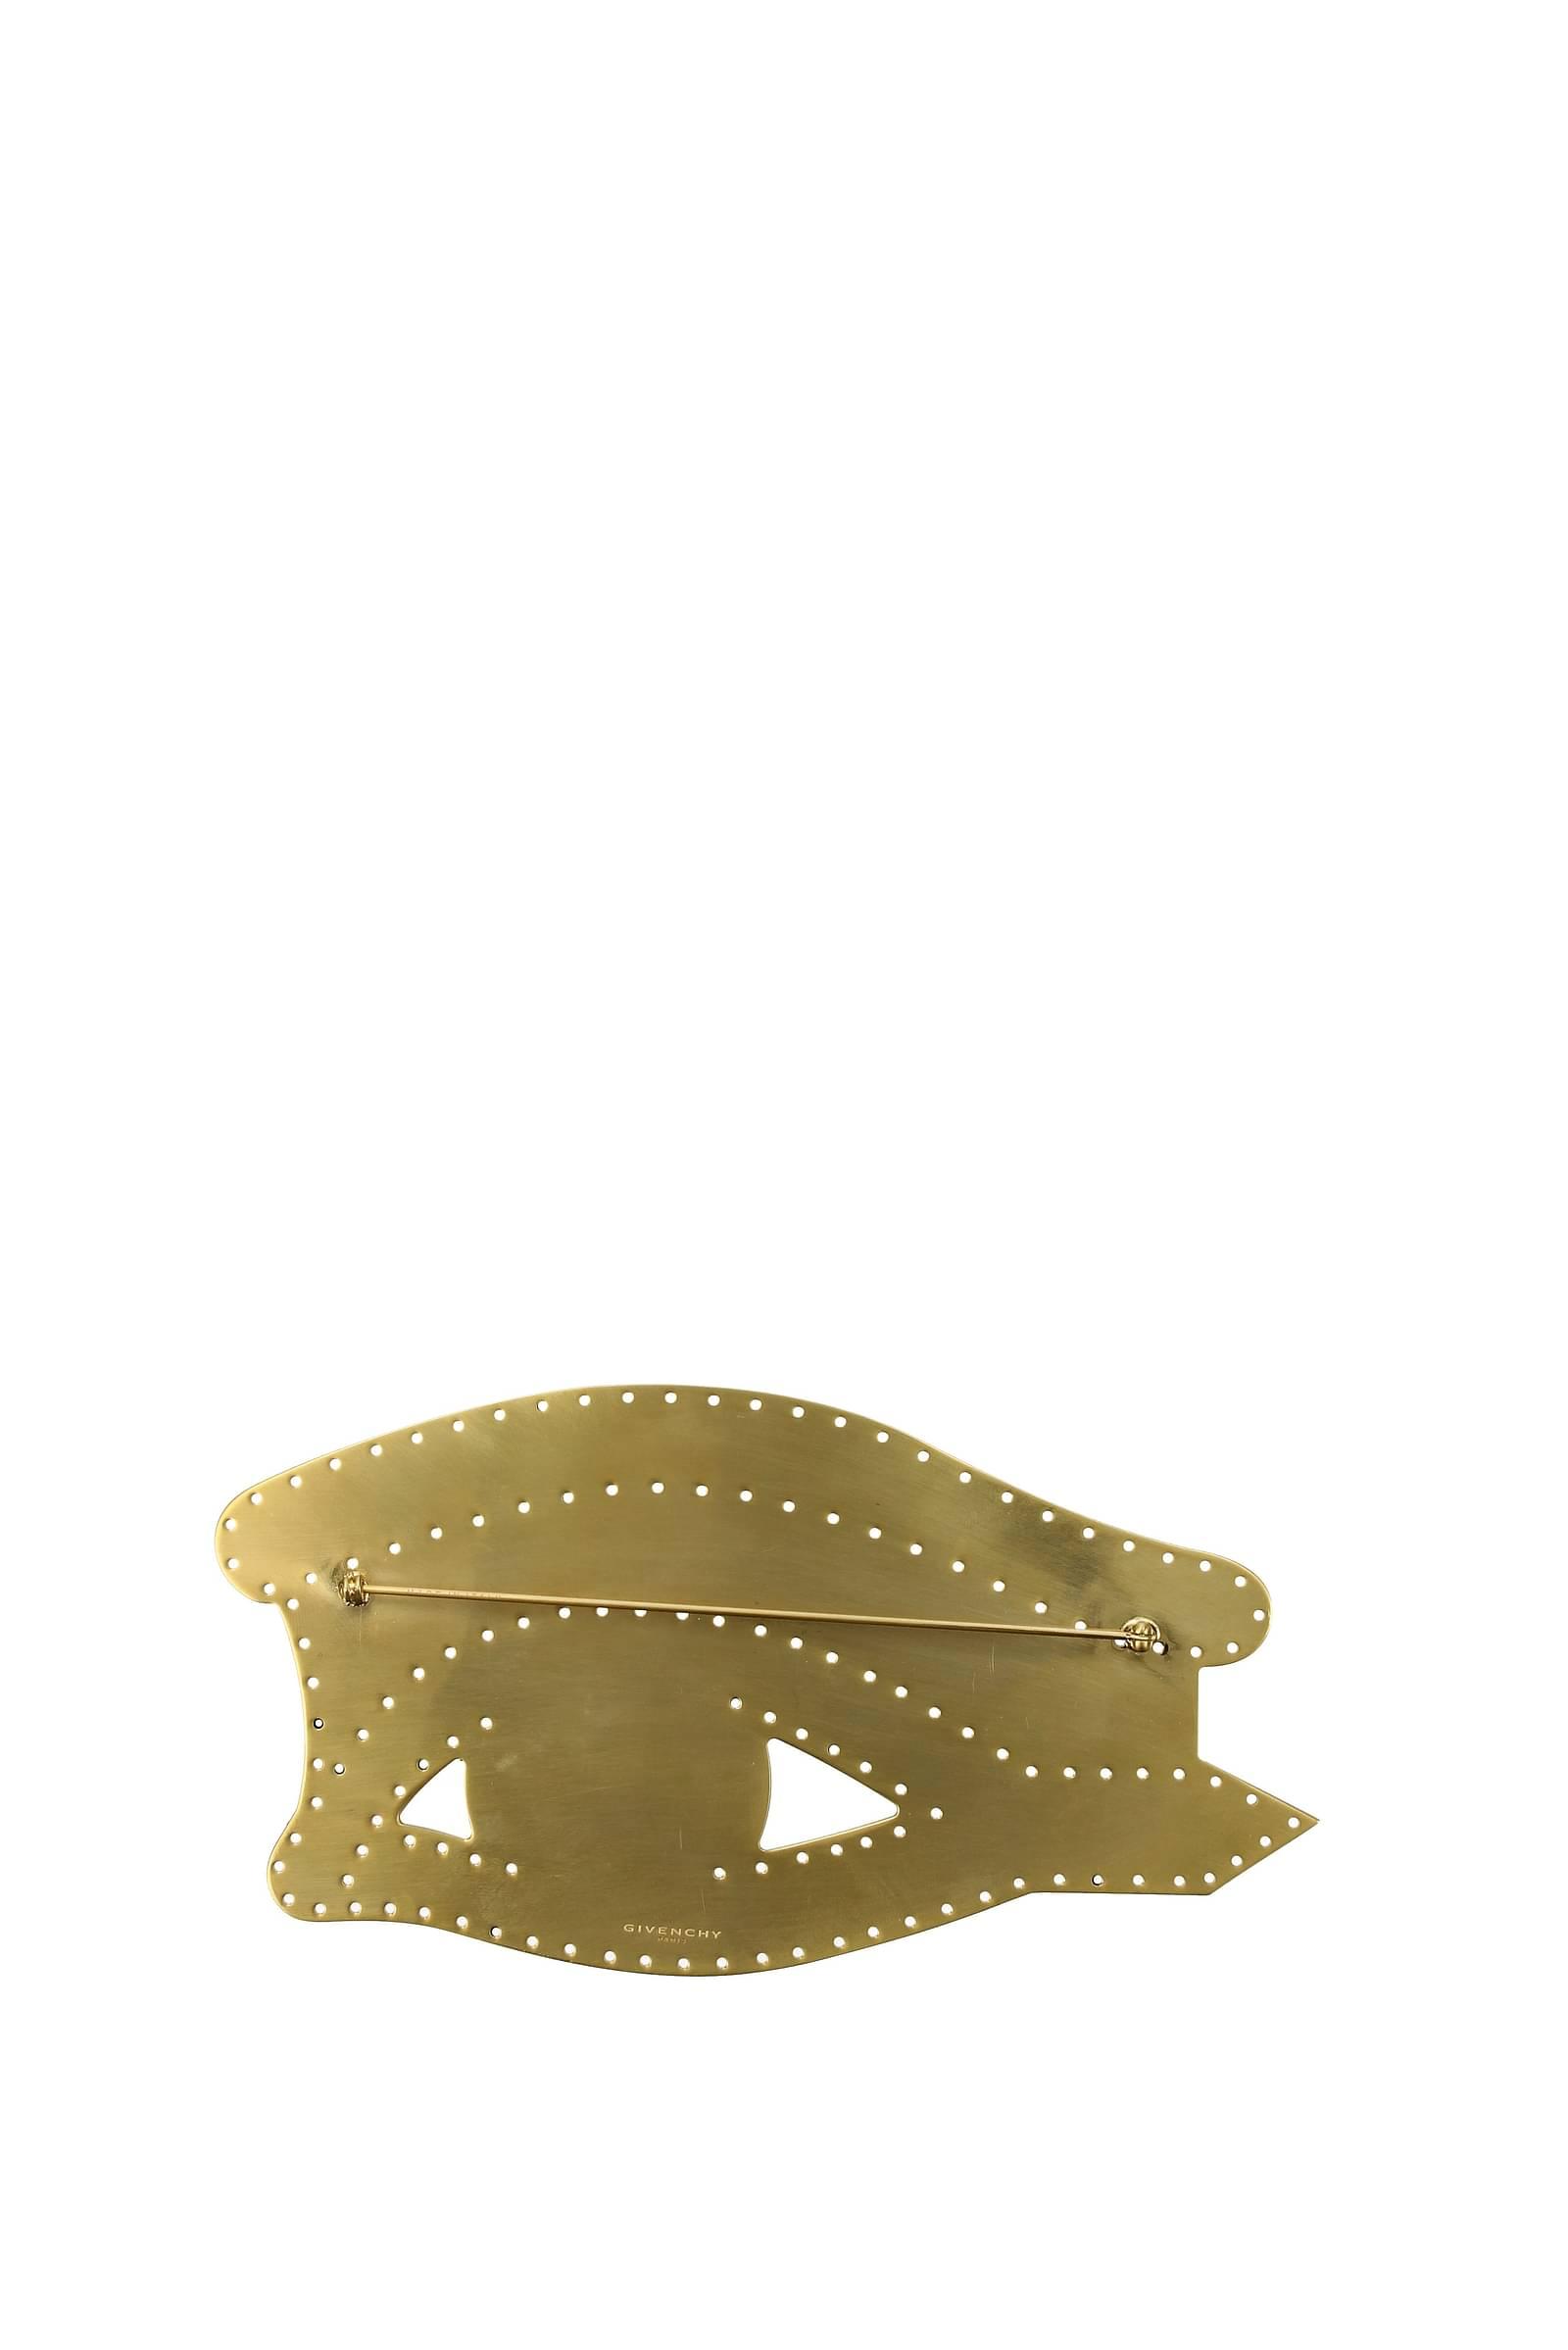 Idee-Regalo-Givenchy-egyptian-eye-brooch-Donna-Ottone-BF03591900 miniatura 2